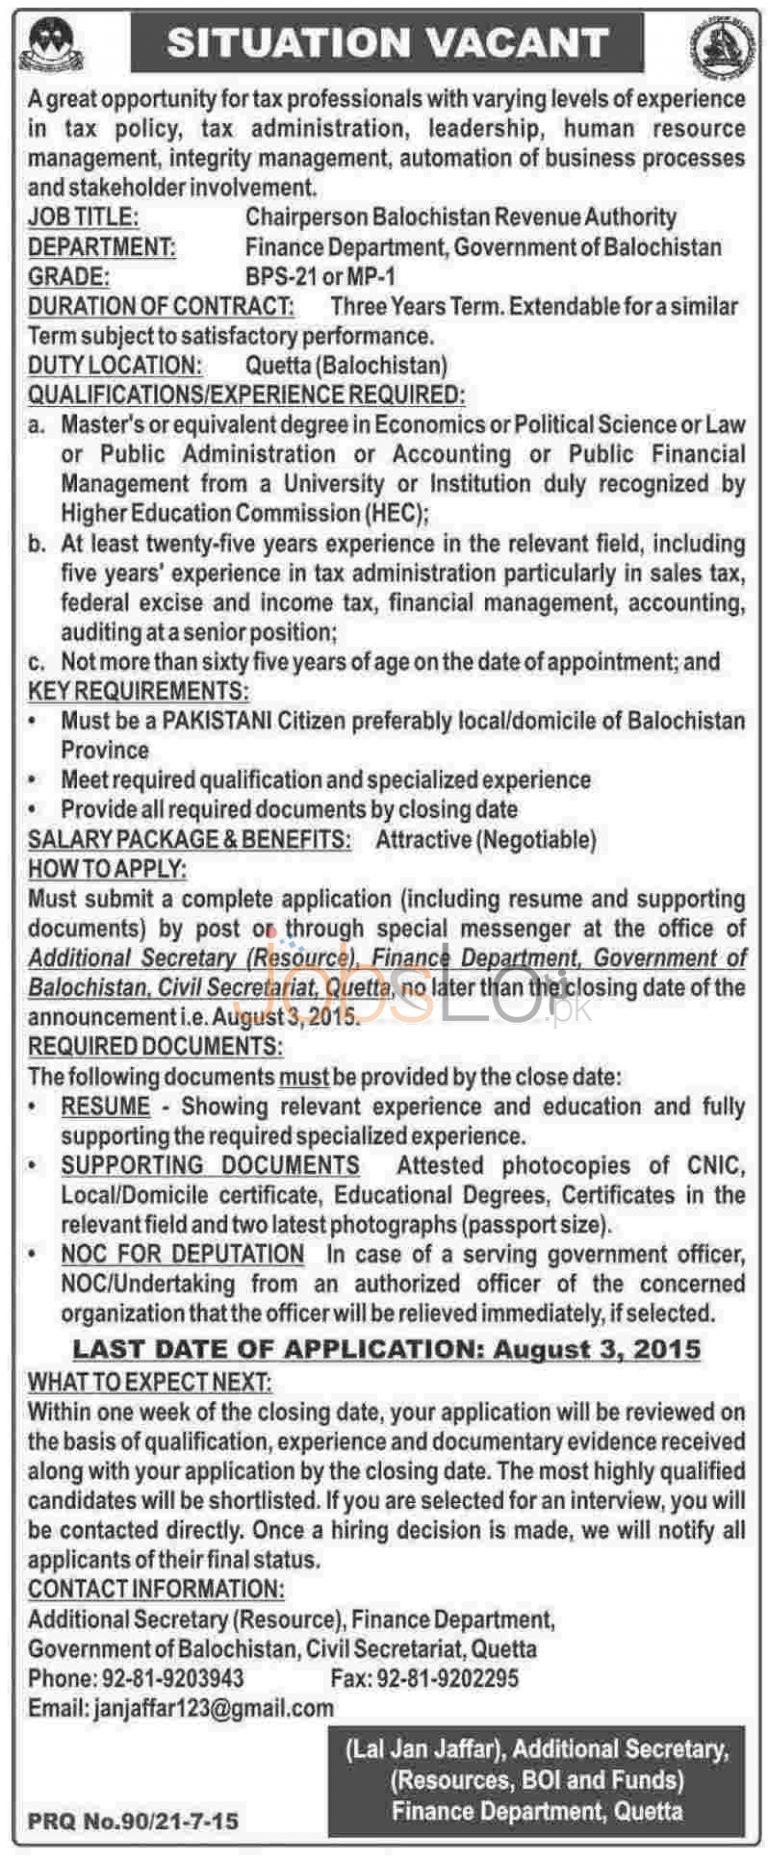 Finance Department Quetta Jobs 2015 Chairperson Balochistan Revenue Authority